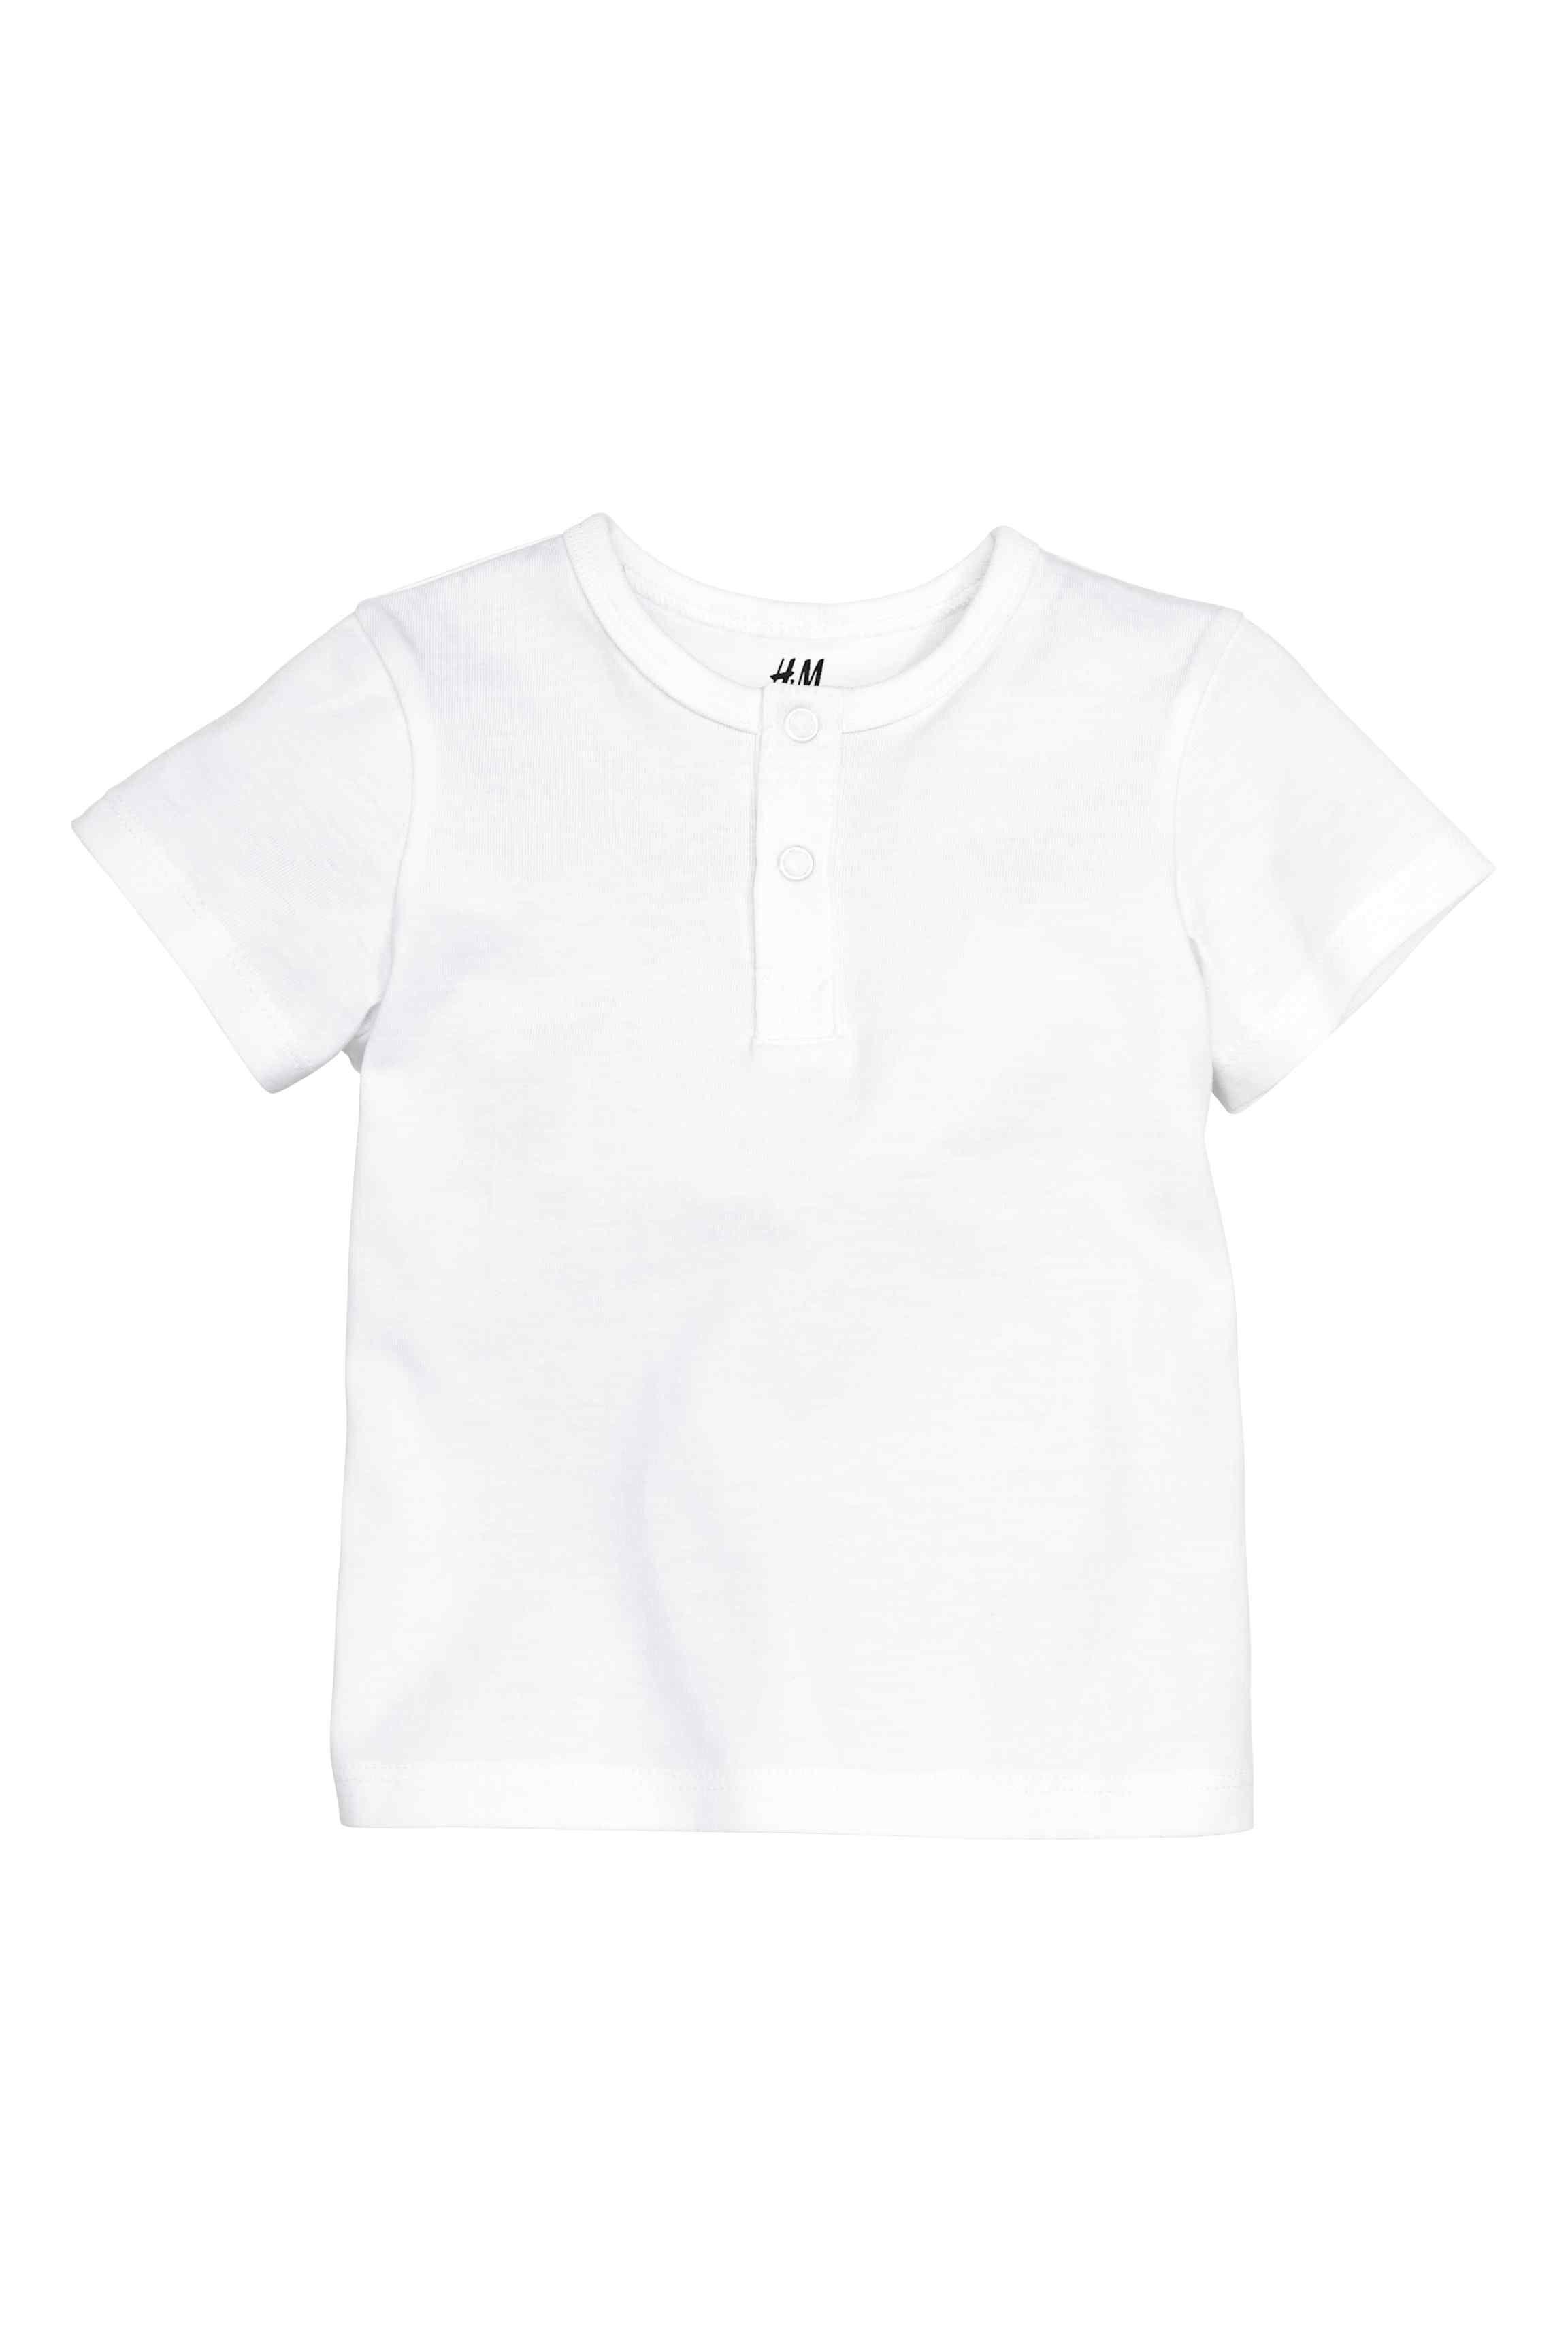 T Shirt Z Guzikami Bialy Dziecko H M Pl Henley Shirts White Jersey Shirt White Short Sleeve Shirt